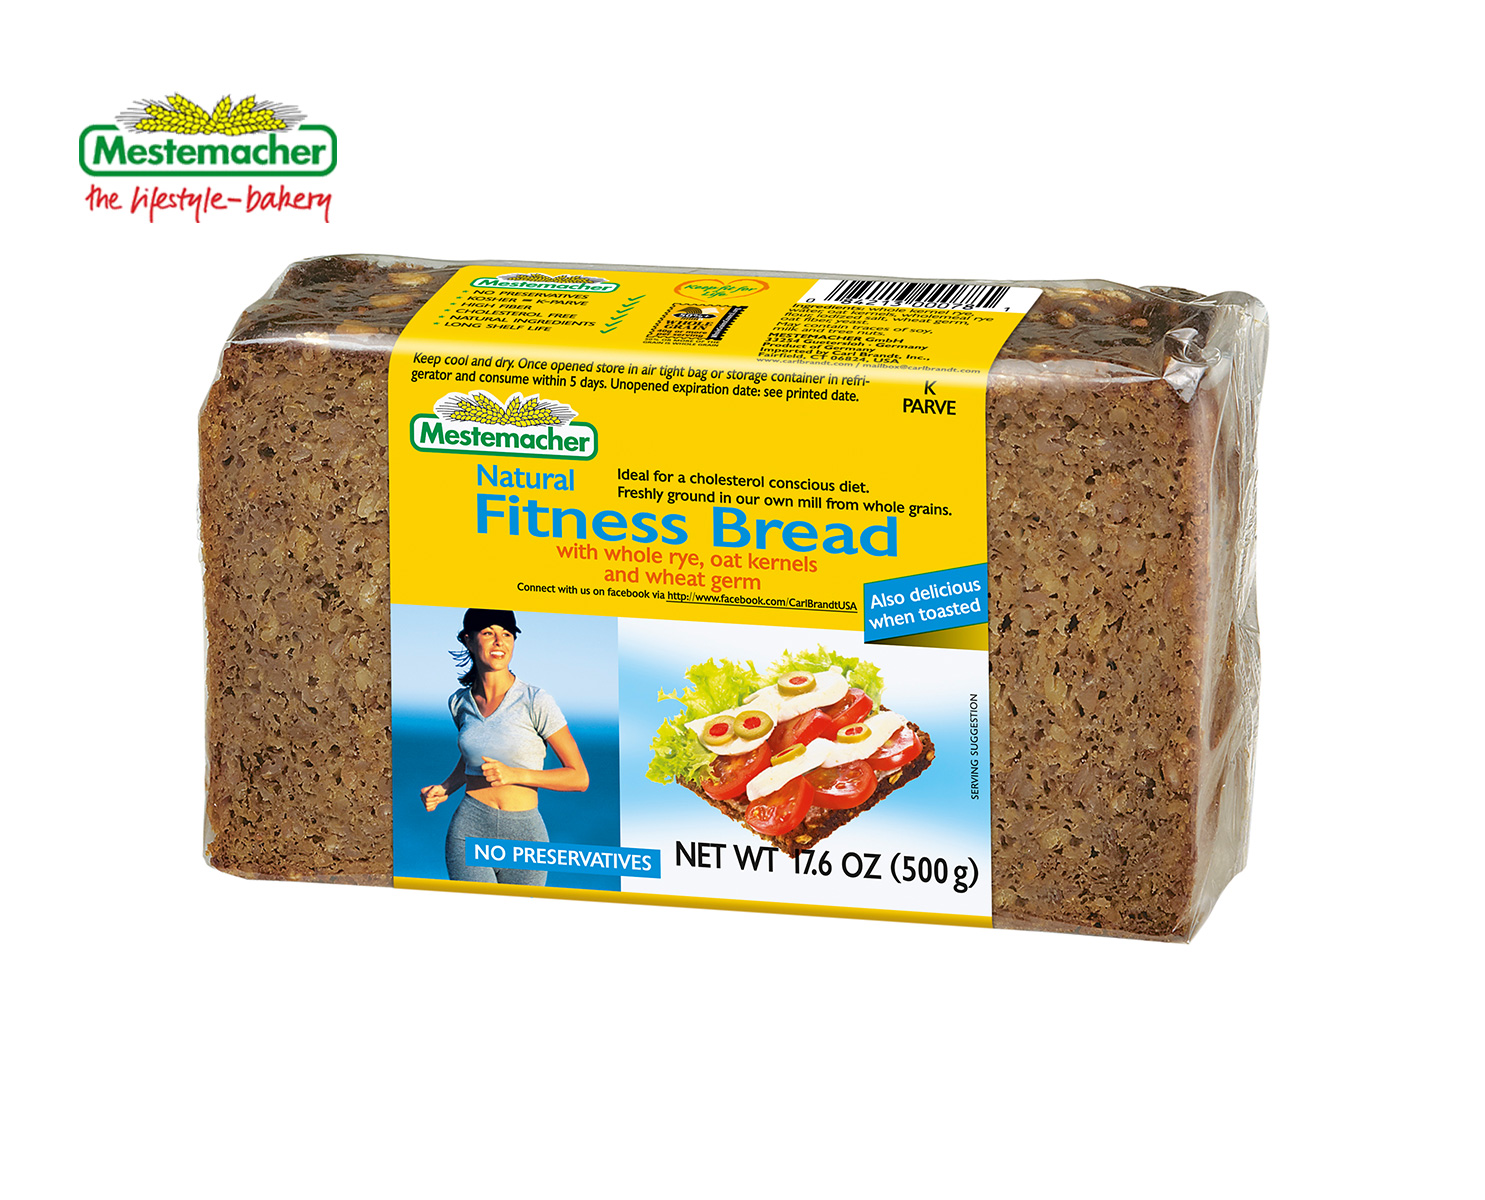 Natural Fitness Bread – Mestemacher